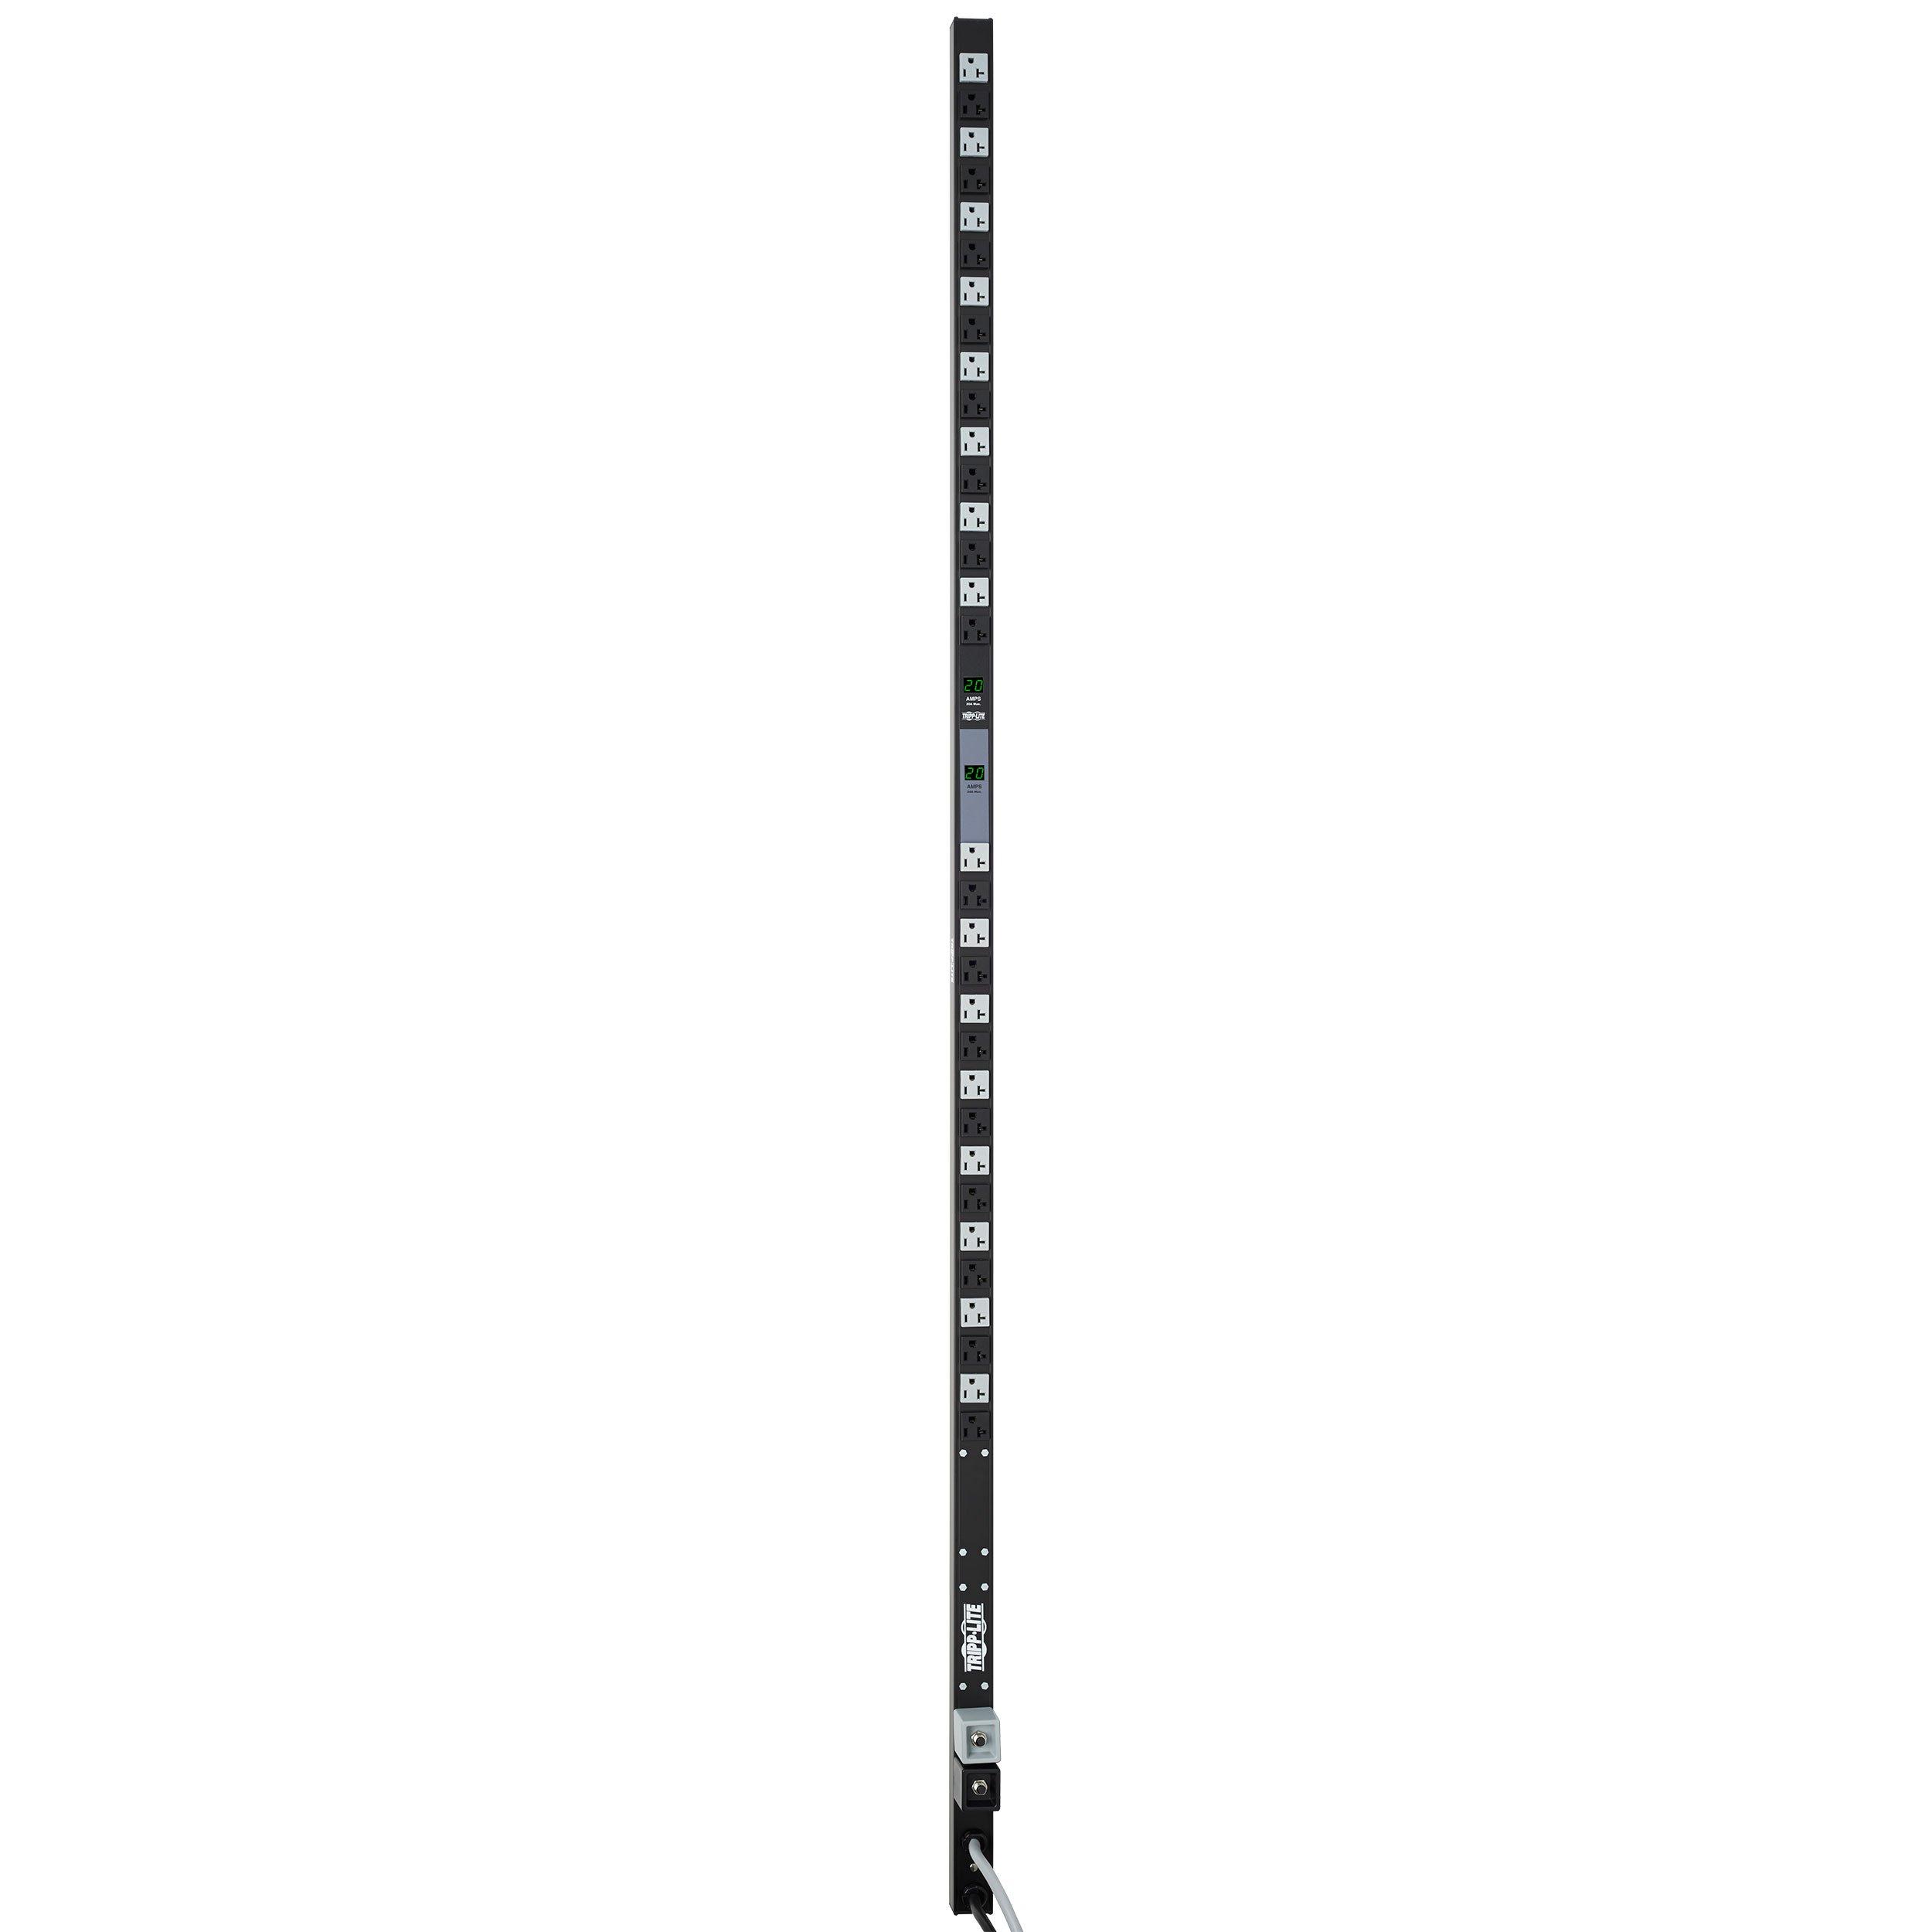 Tripp Lite Metered PDU, 20A Dual Circuit, 32 Outlets (5-15/20R), 120V, L5-20P/5-20P, 10 ft. Cord, 0U Vertical Rack-Mount Power (PDUMV40)